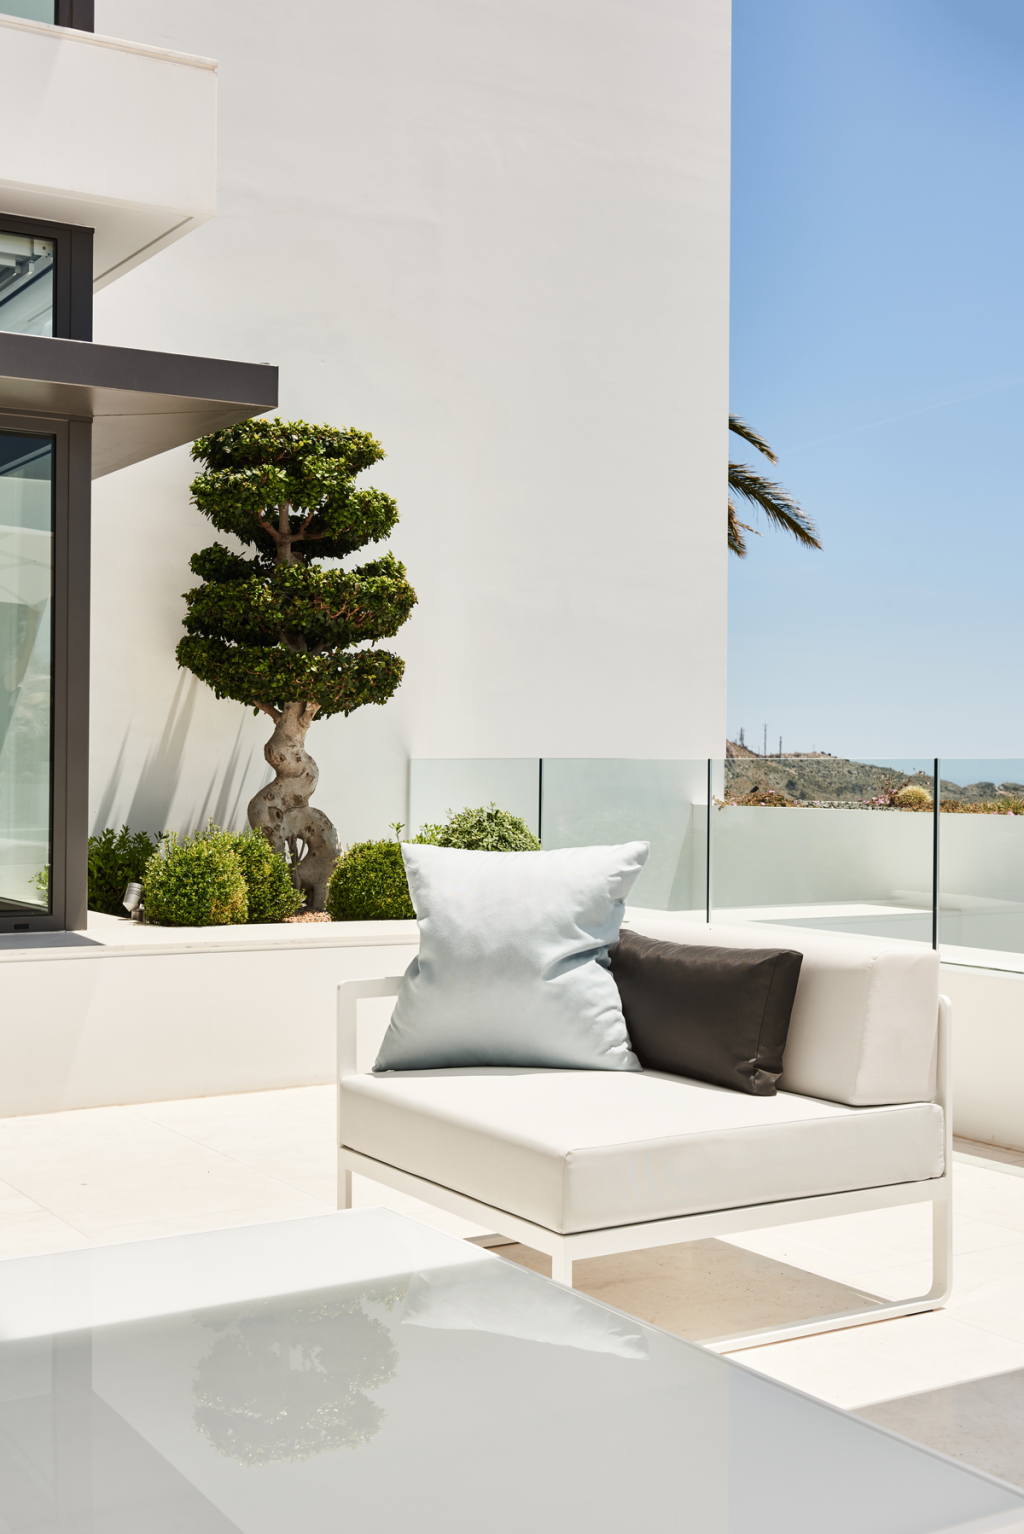 Sit lounge sofa Altea outdoor furniture bivaq blueport altea luxury